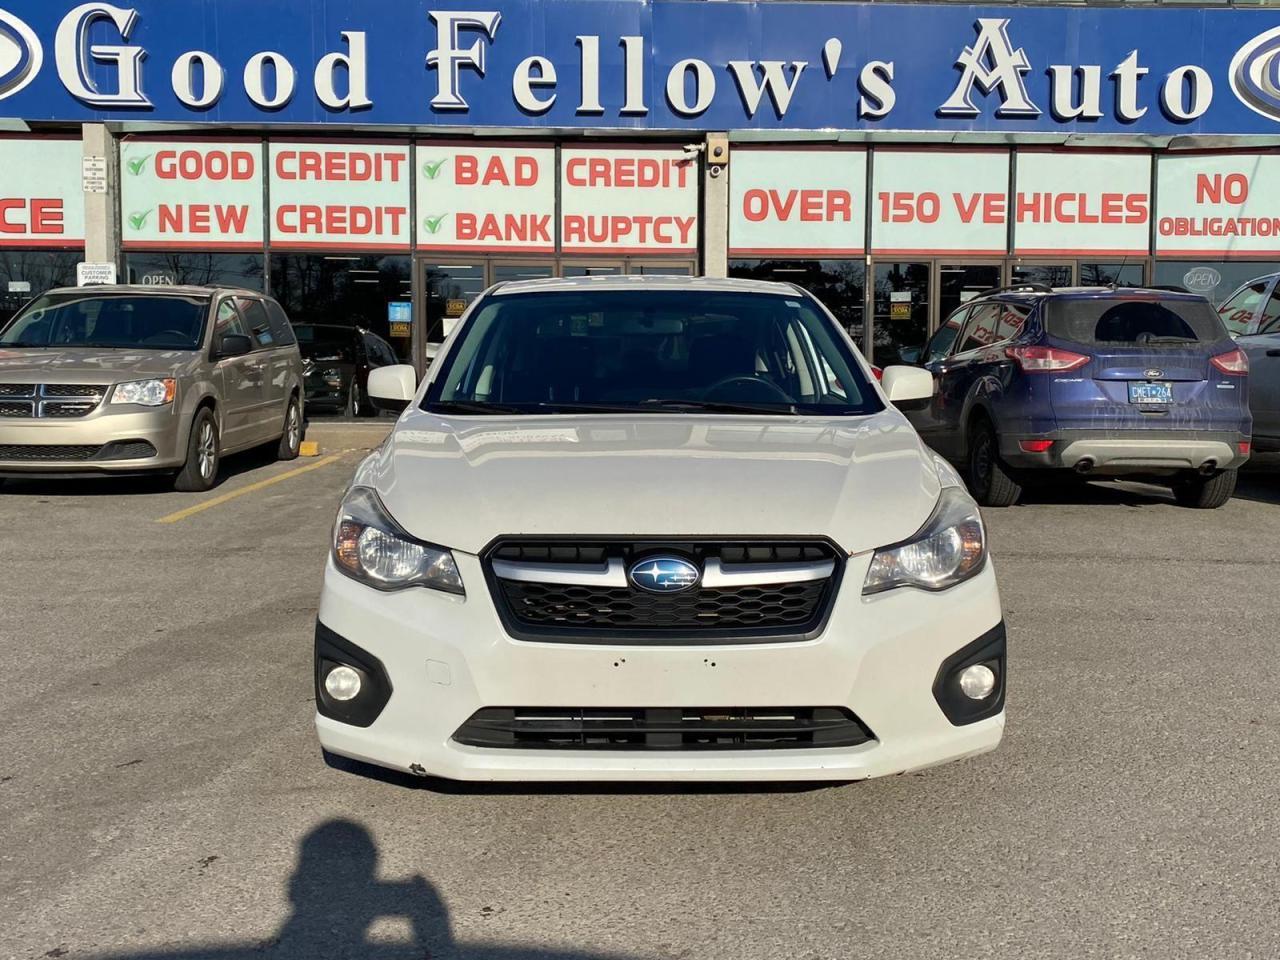 used 2014 Subaru Impreza car, priced at $7,900